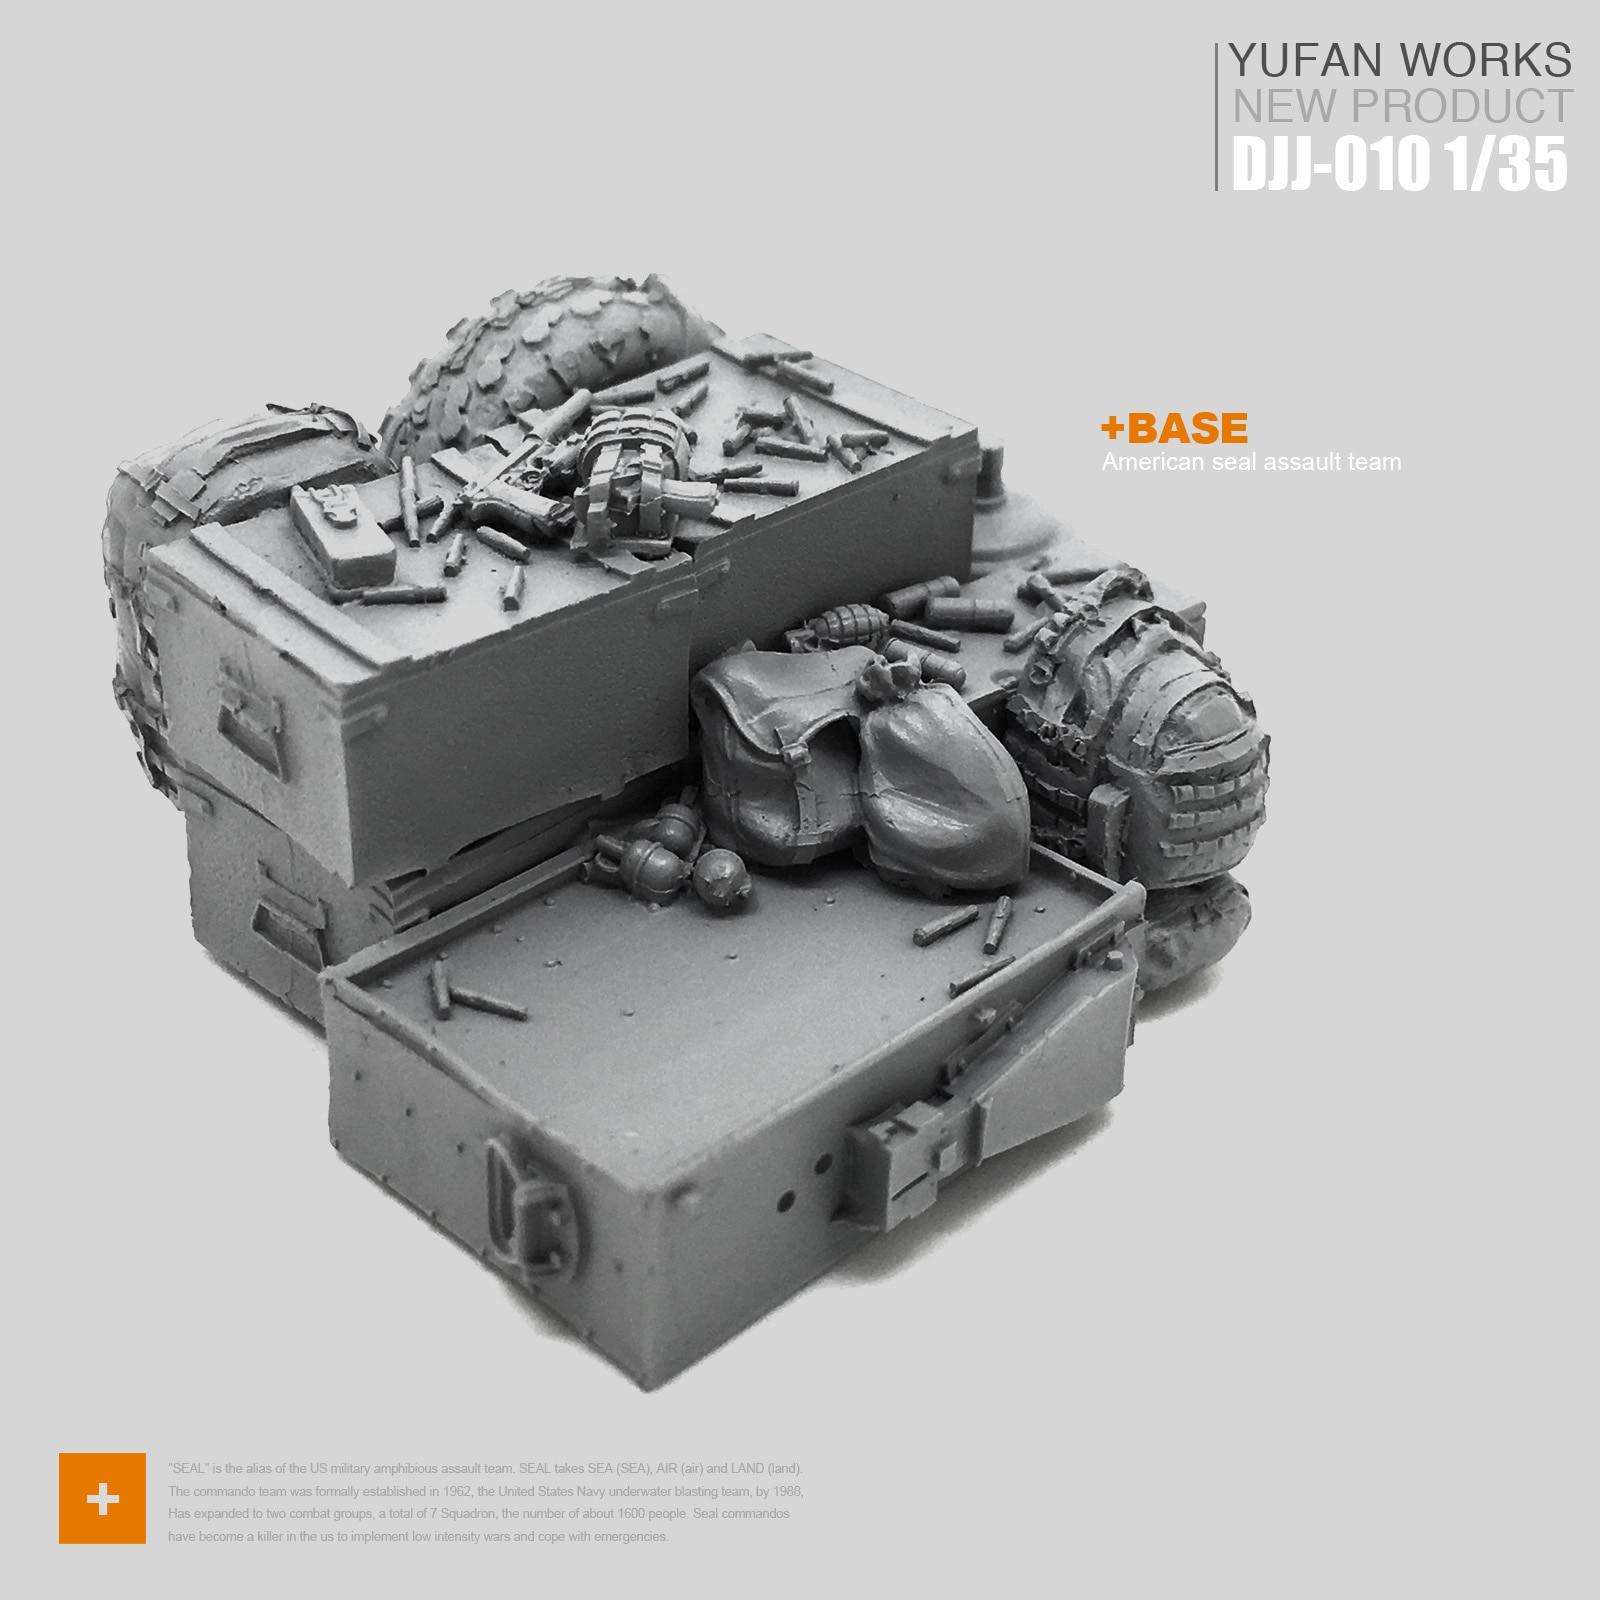 Yufan Model 1/35 Resin Platform Soldier Resin Scene Djj-10